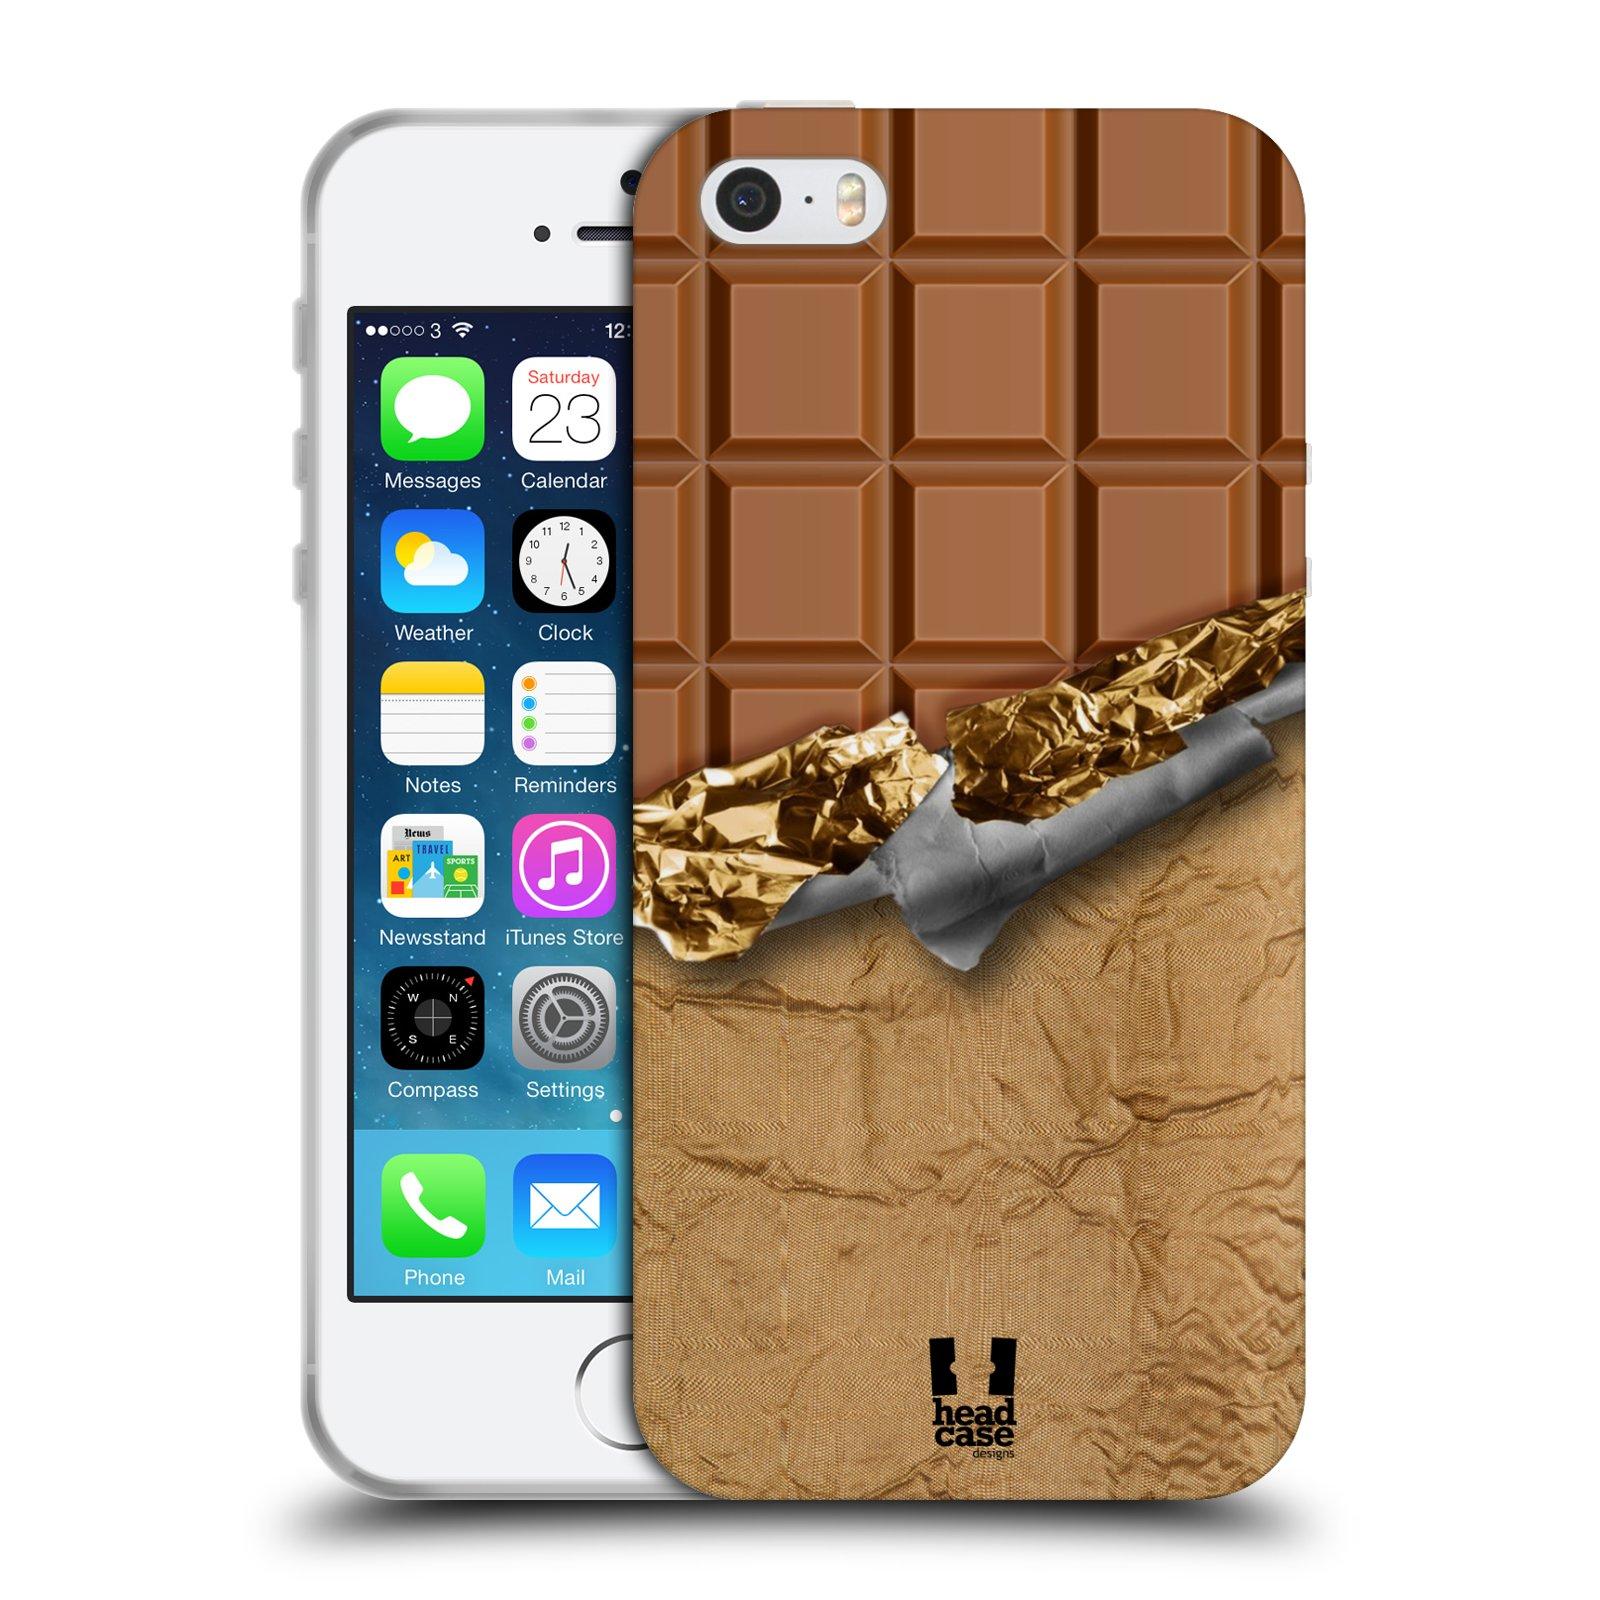 Silikonové pouzdro na mobil Apple iPhone 5, 5S, SE - Head Case - ČOKOFOILED